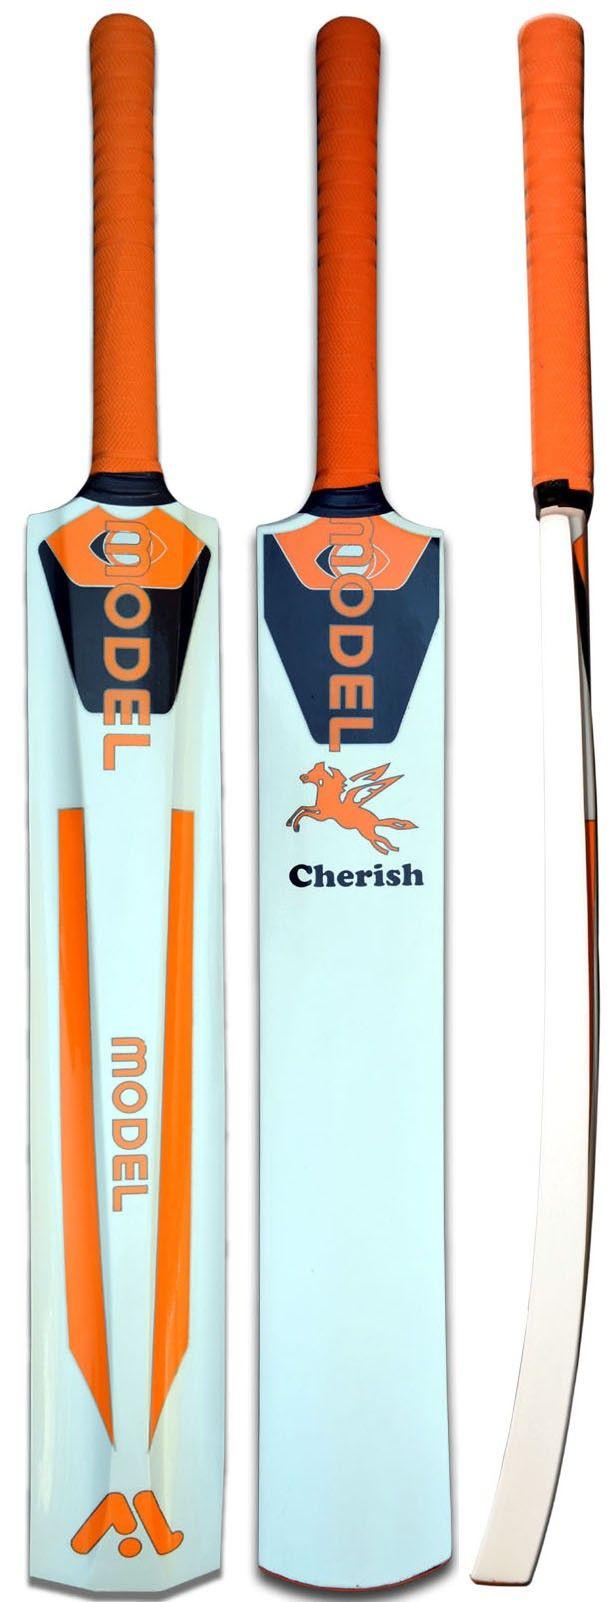 Model Tape Ball Indoor Cricket Bat Cherish 5000 Light Full Size Cricket Bat Bat Cricket Logo